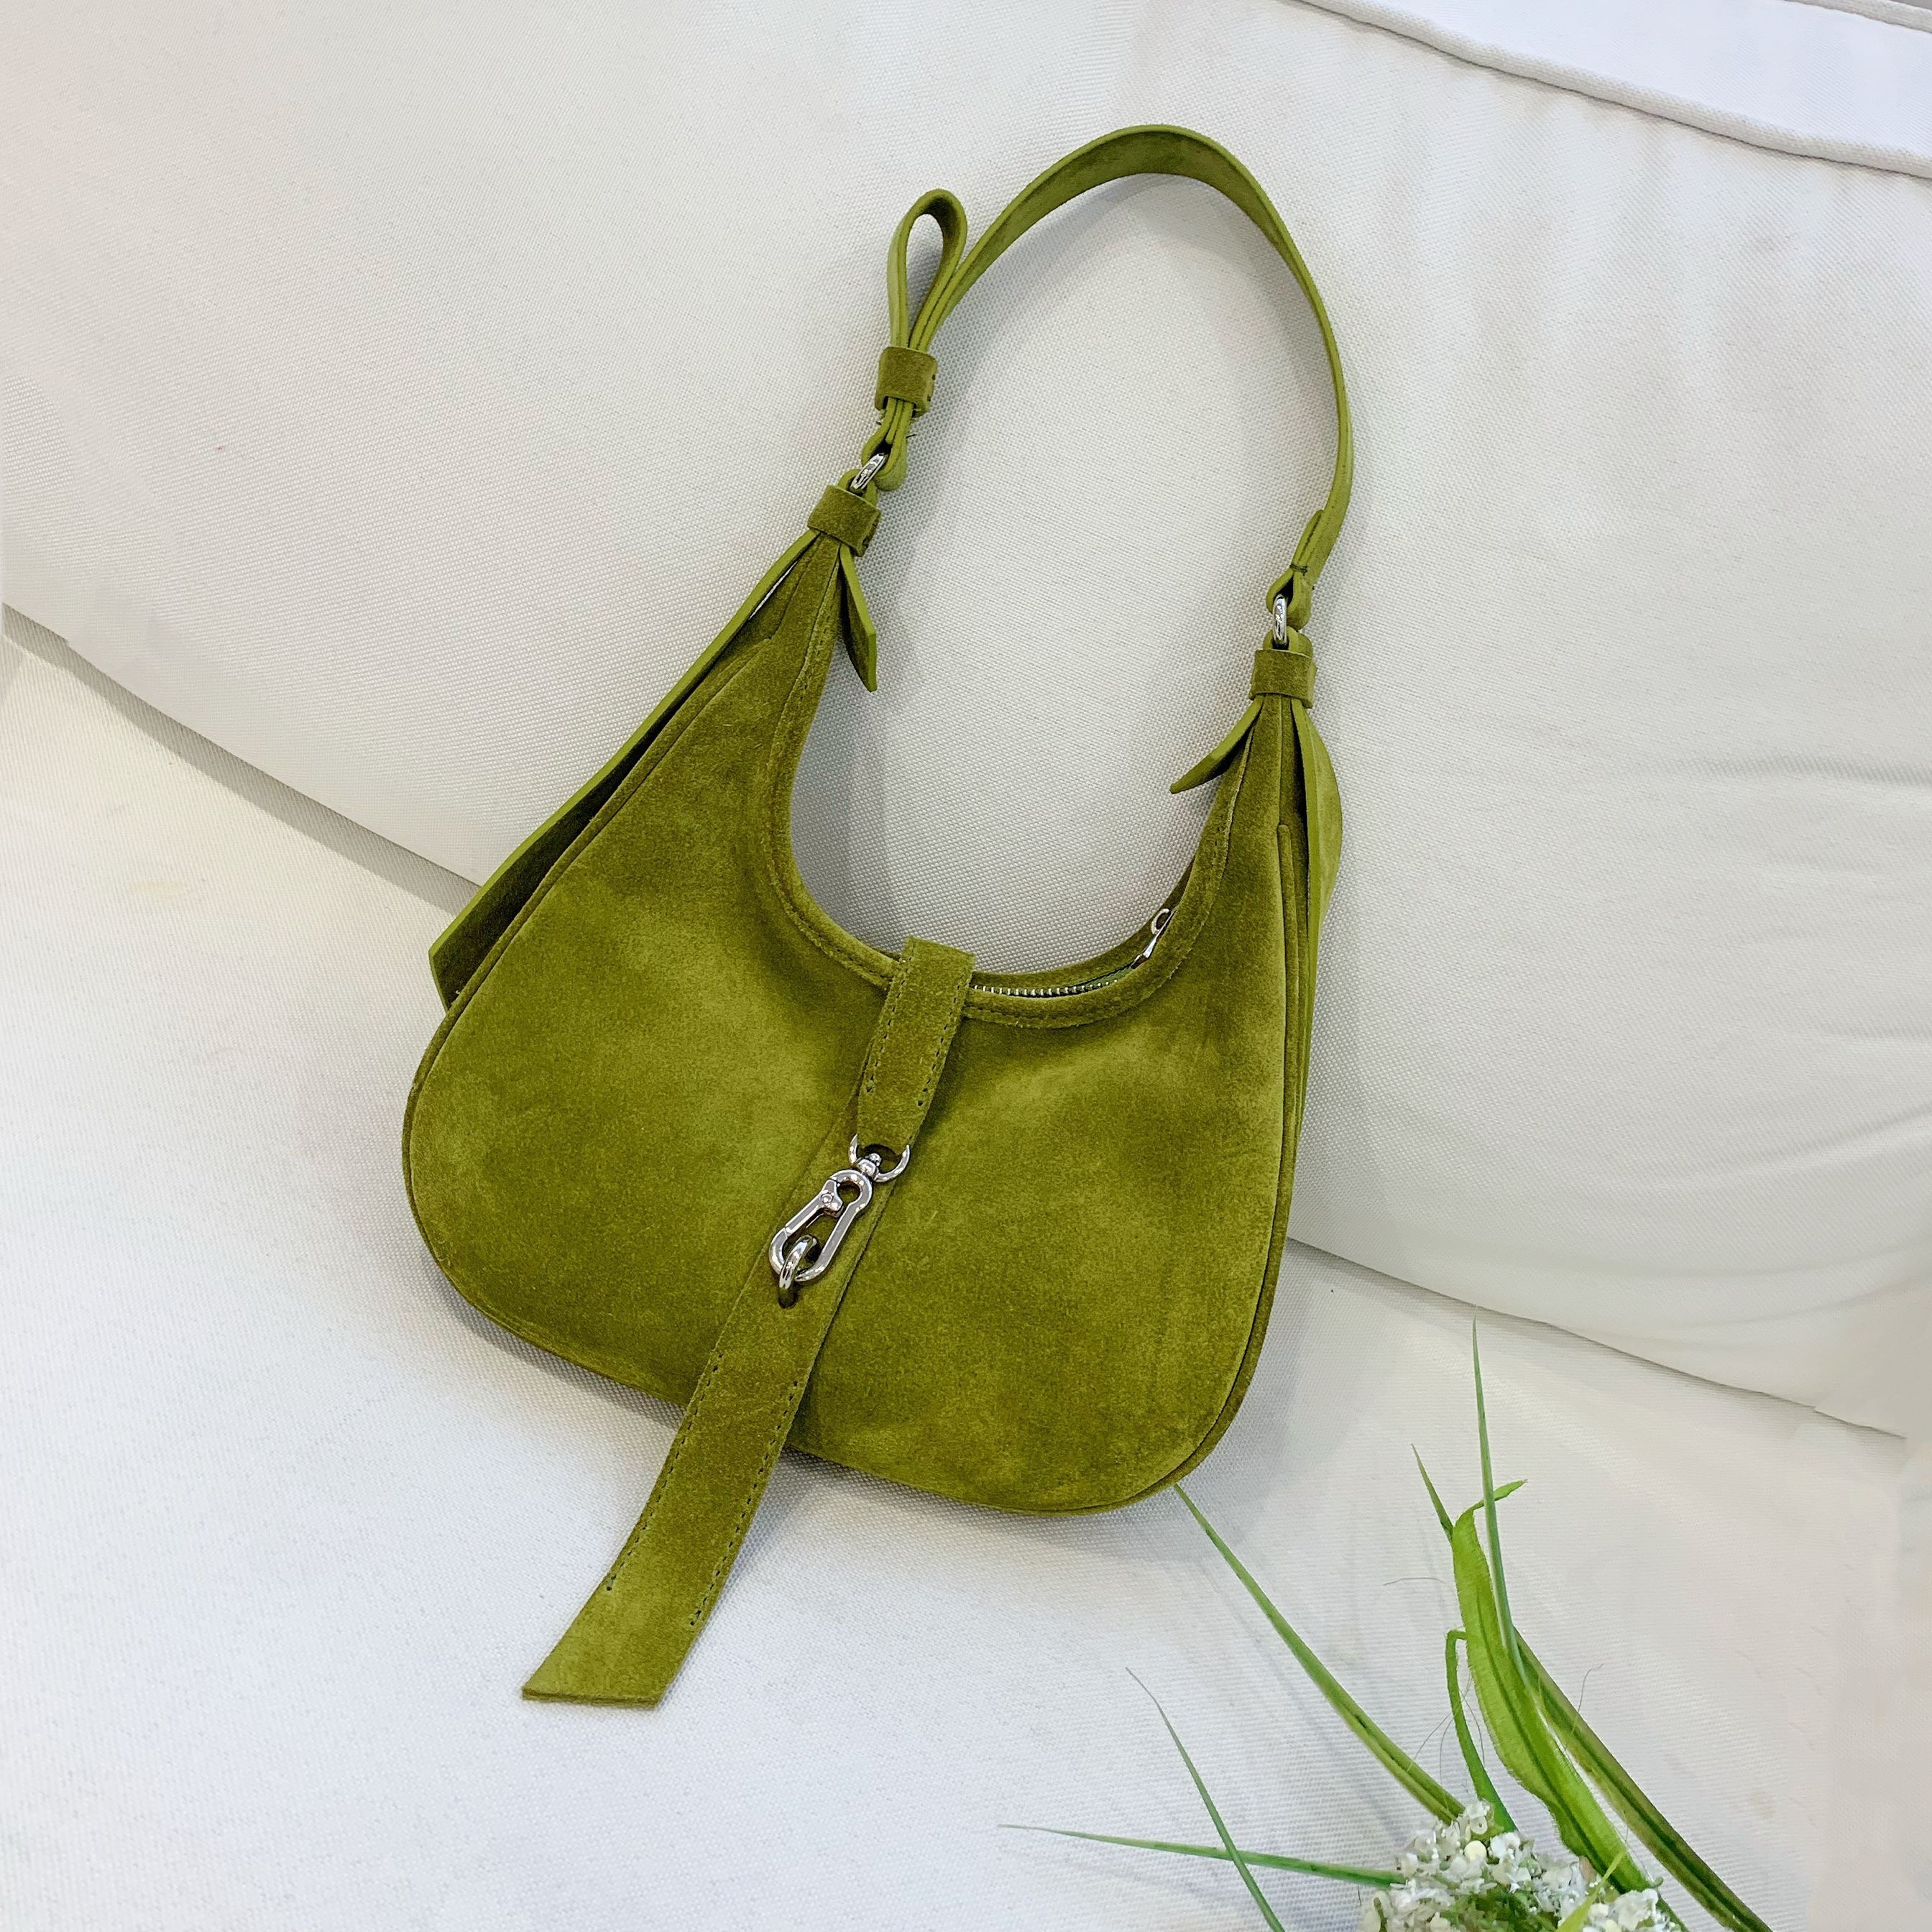 Top handle Bags Female Leisure Nubuck Casual Handbag Trendy Suede Leather Green Handbag Free Shipping Designer